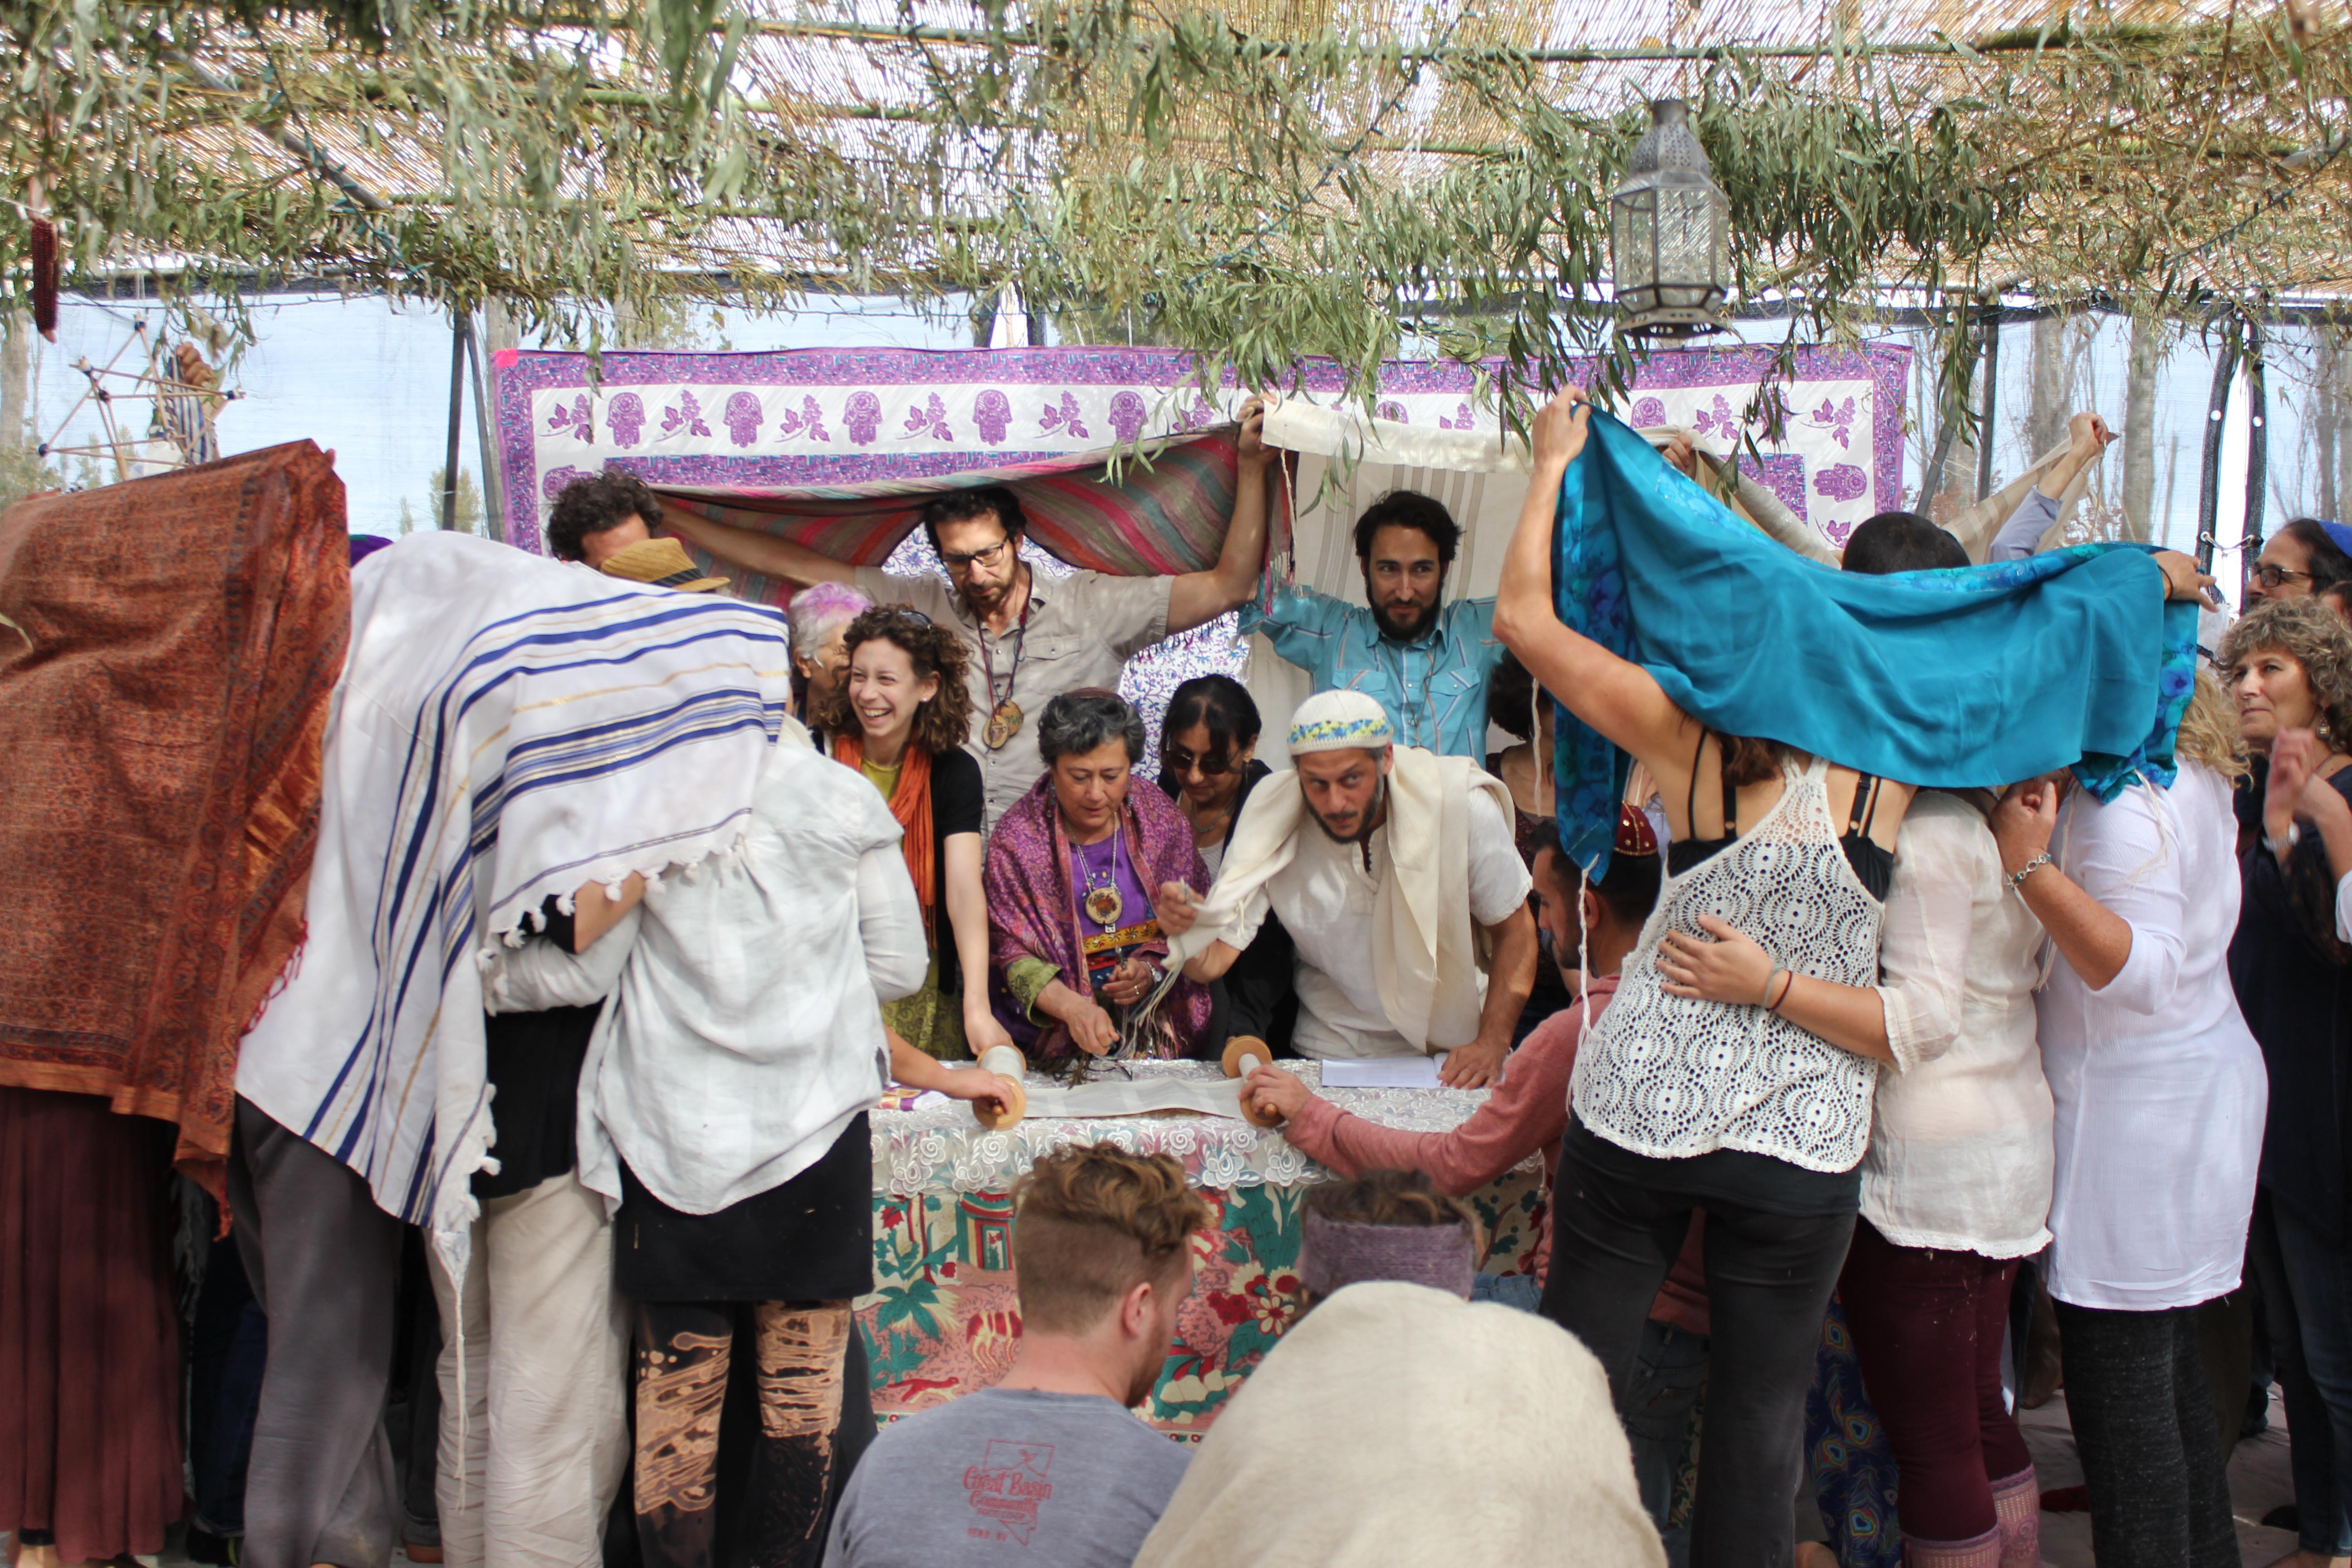 A large group aliyah during the Shabbat morning Torah service at Wilderness Torah's Sukkot on the Farm, Oct. 2016 (Photo/David A.M. Wilensky)